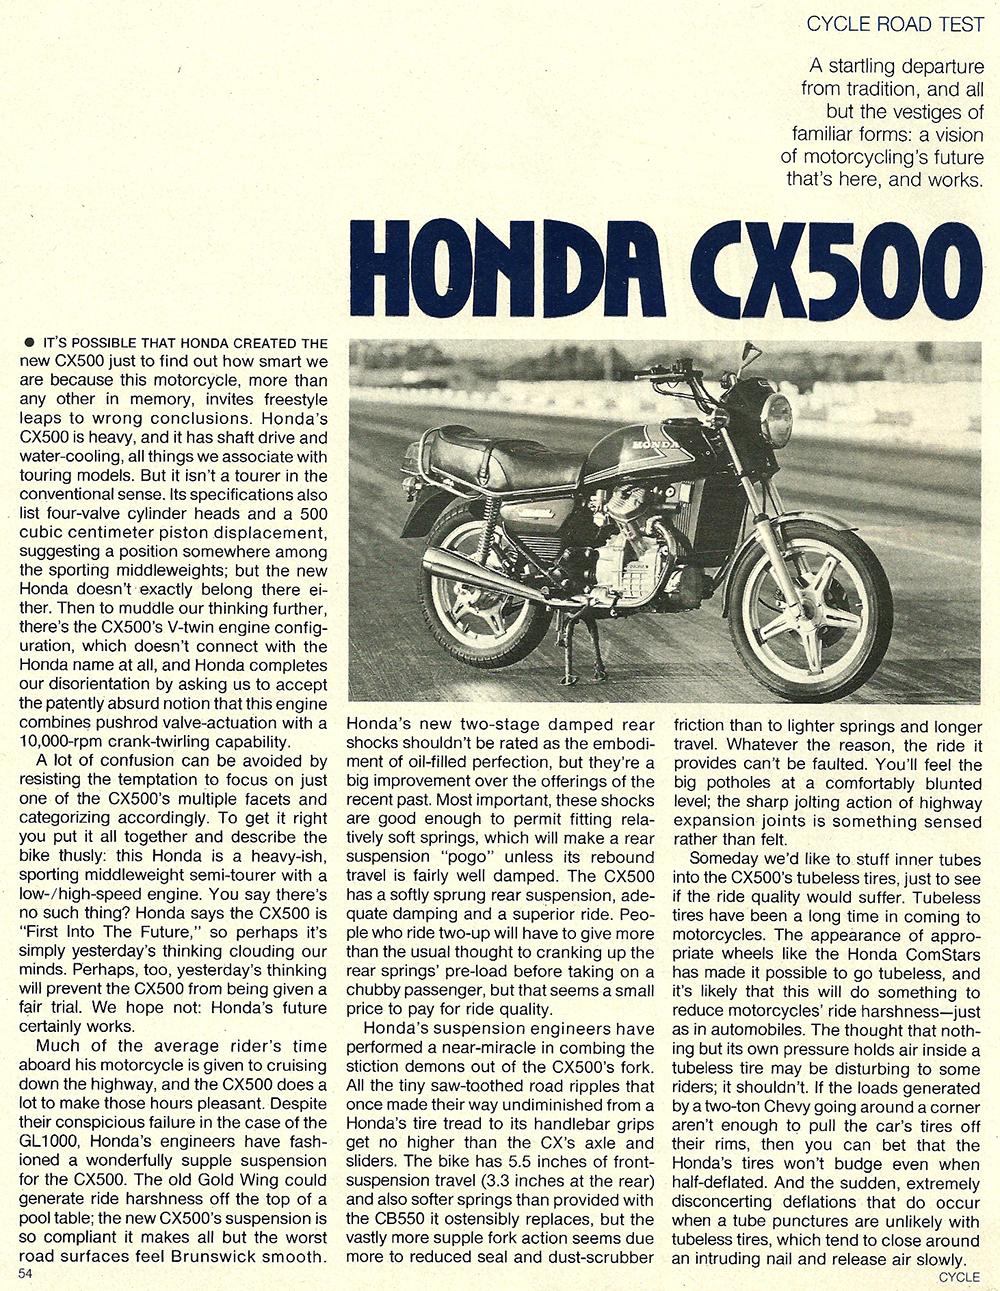 1978 Honda CX500 road test 01.jpg